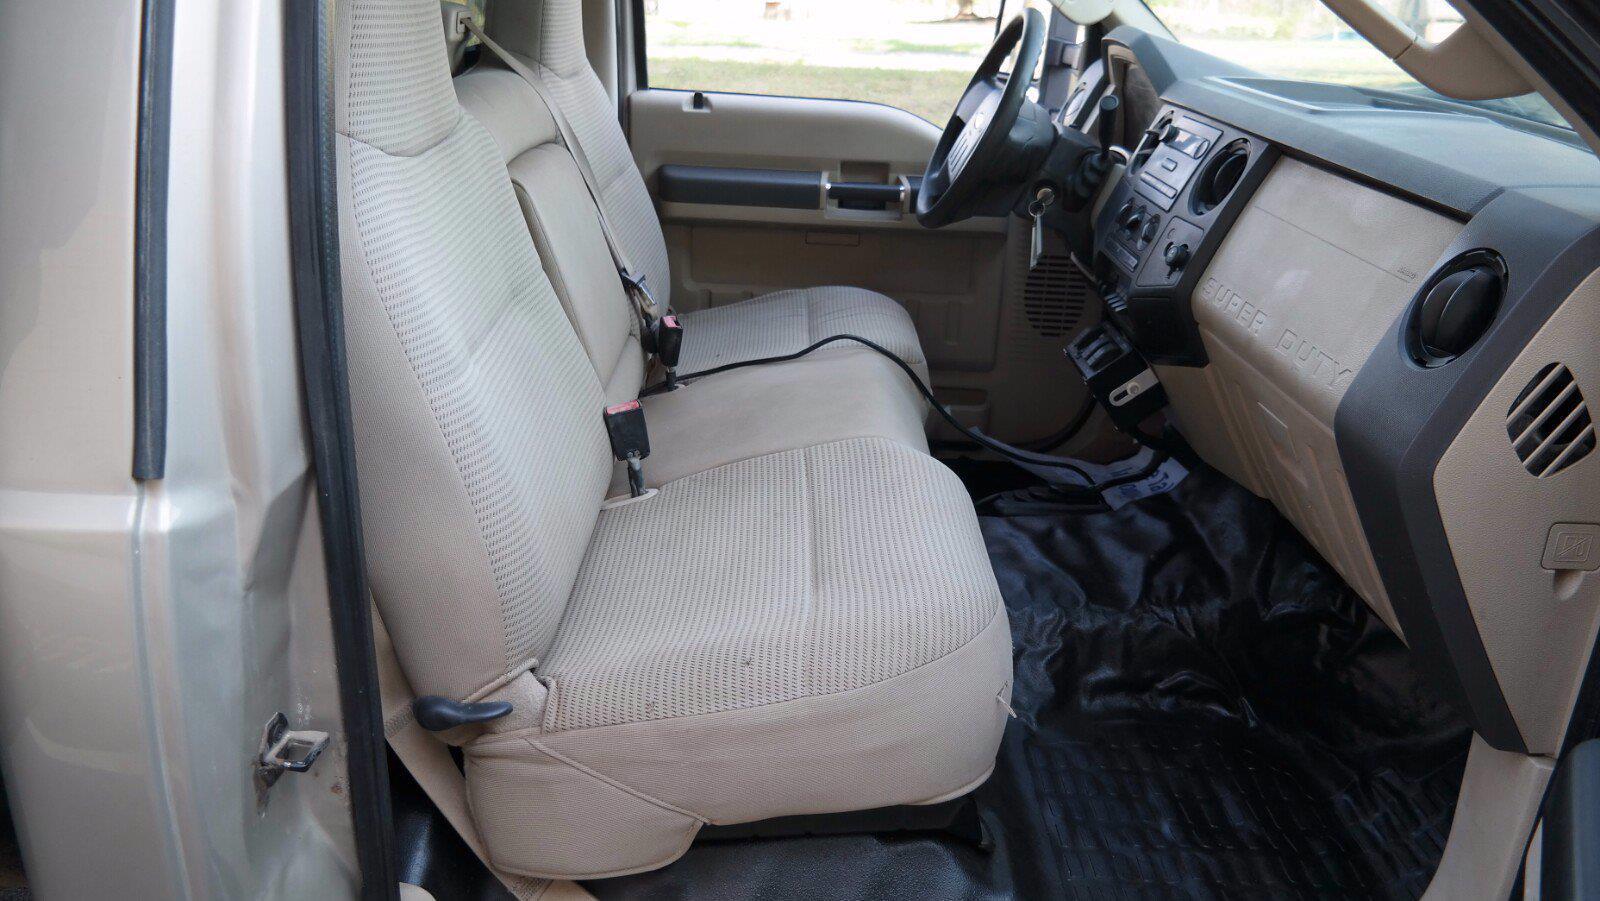 2008 Ford F-550 Regular Cab DRW 4x4, Dump Body #FL1138J - photo 22